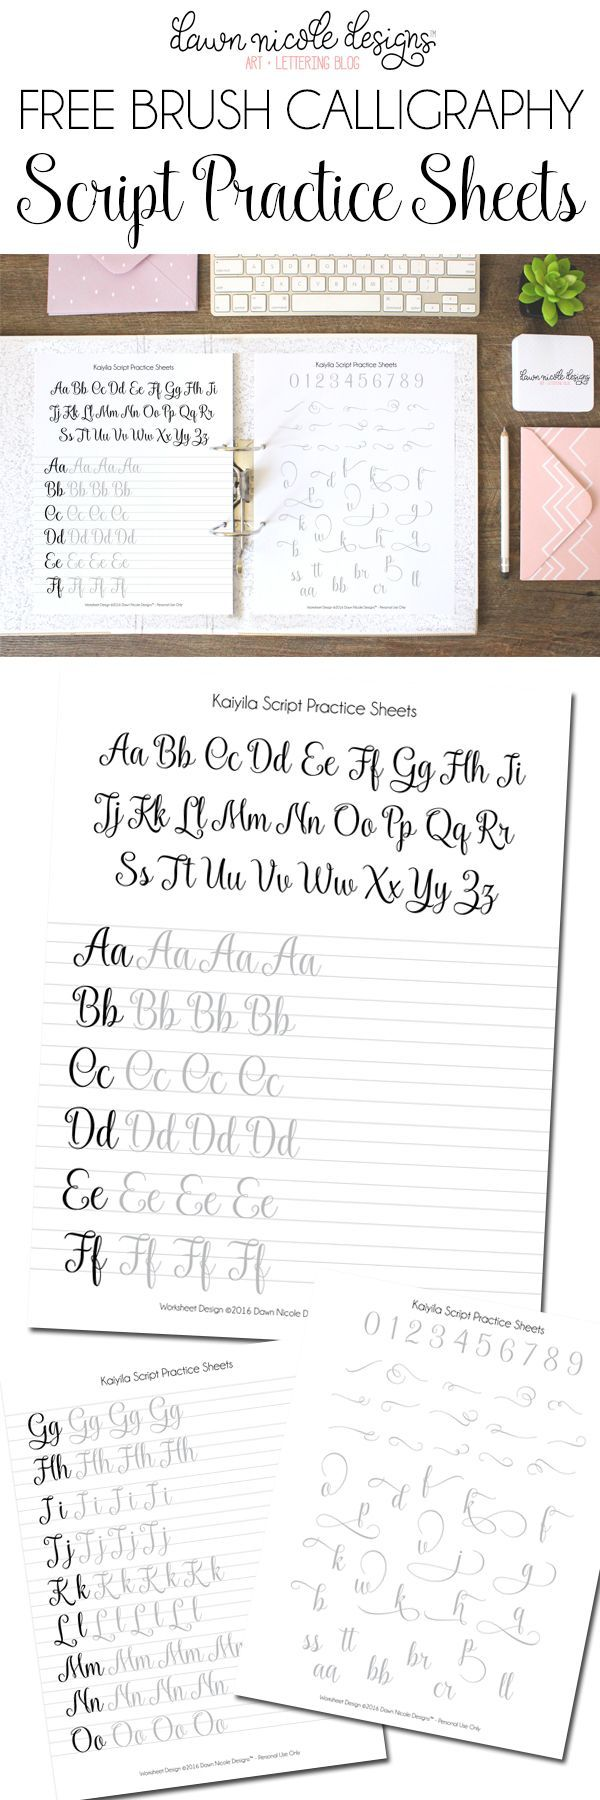 FREE Script Brush Calligraphy Worksheets | http://DawnNicoleDesigns.com